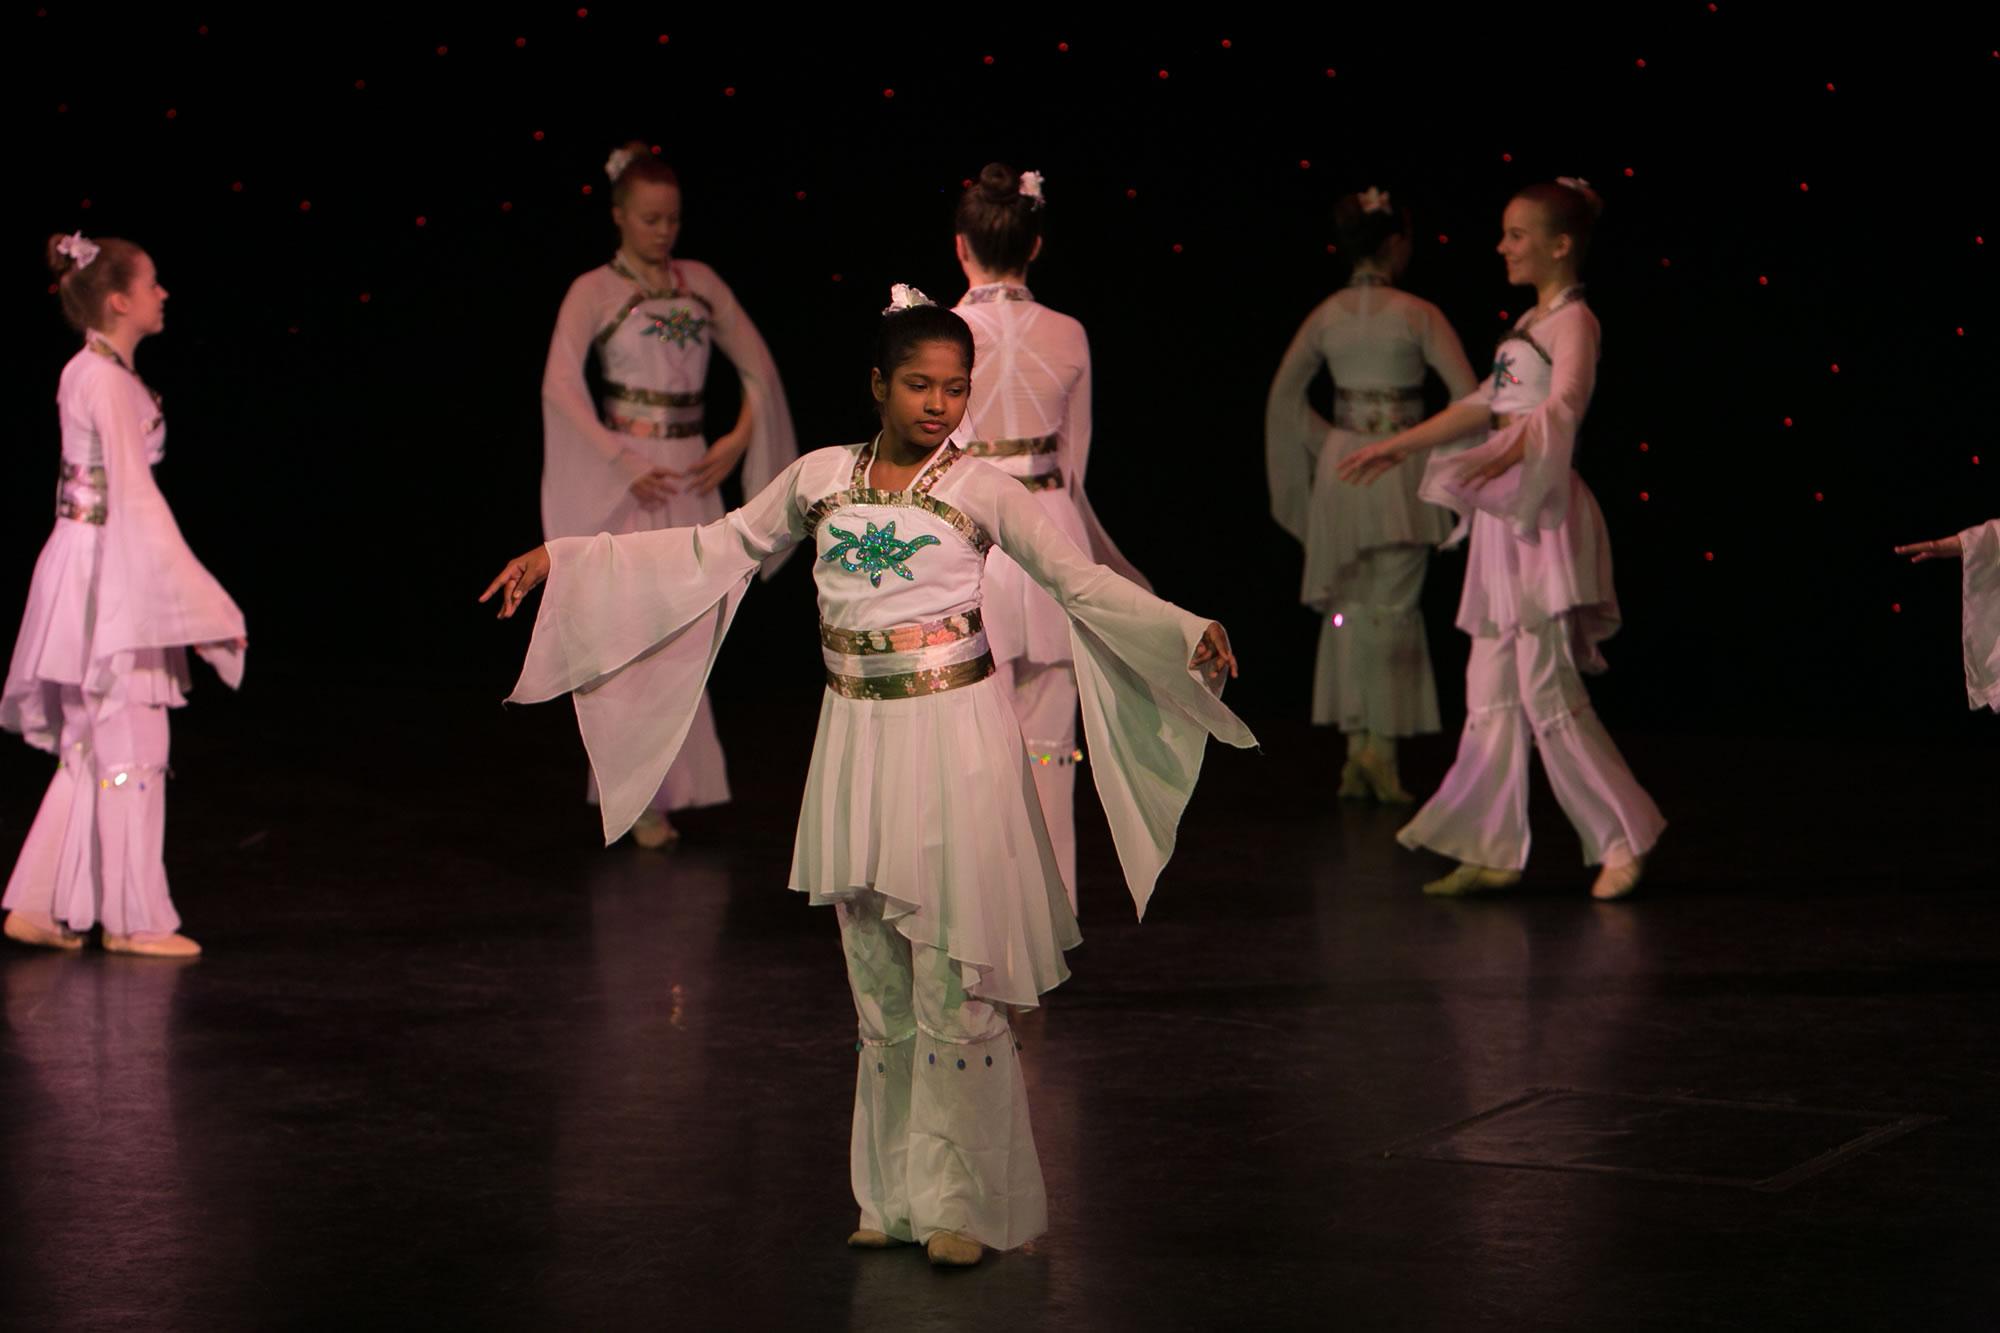 Hitchin_School_of_Dance_Show_2019-SM1_2475.jpg